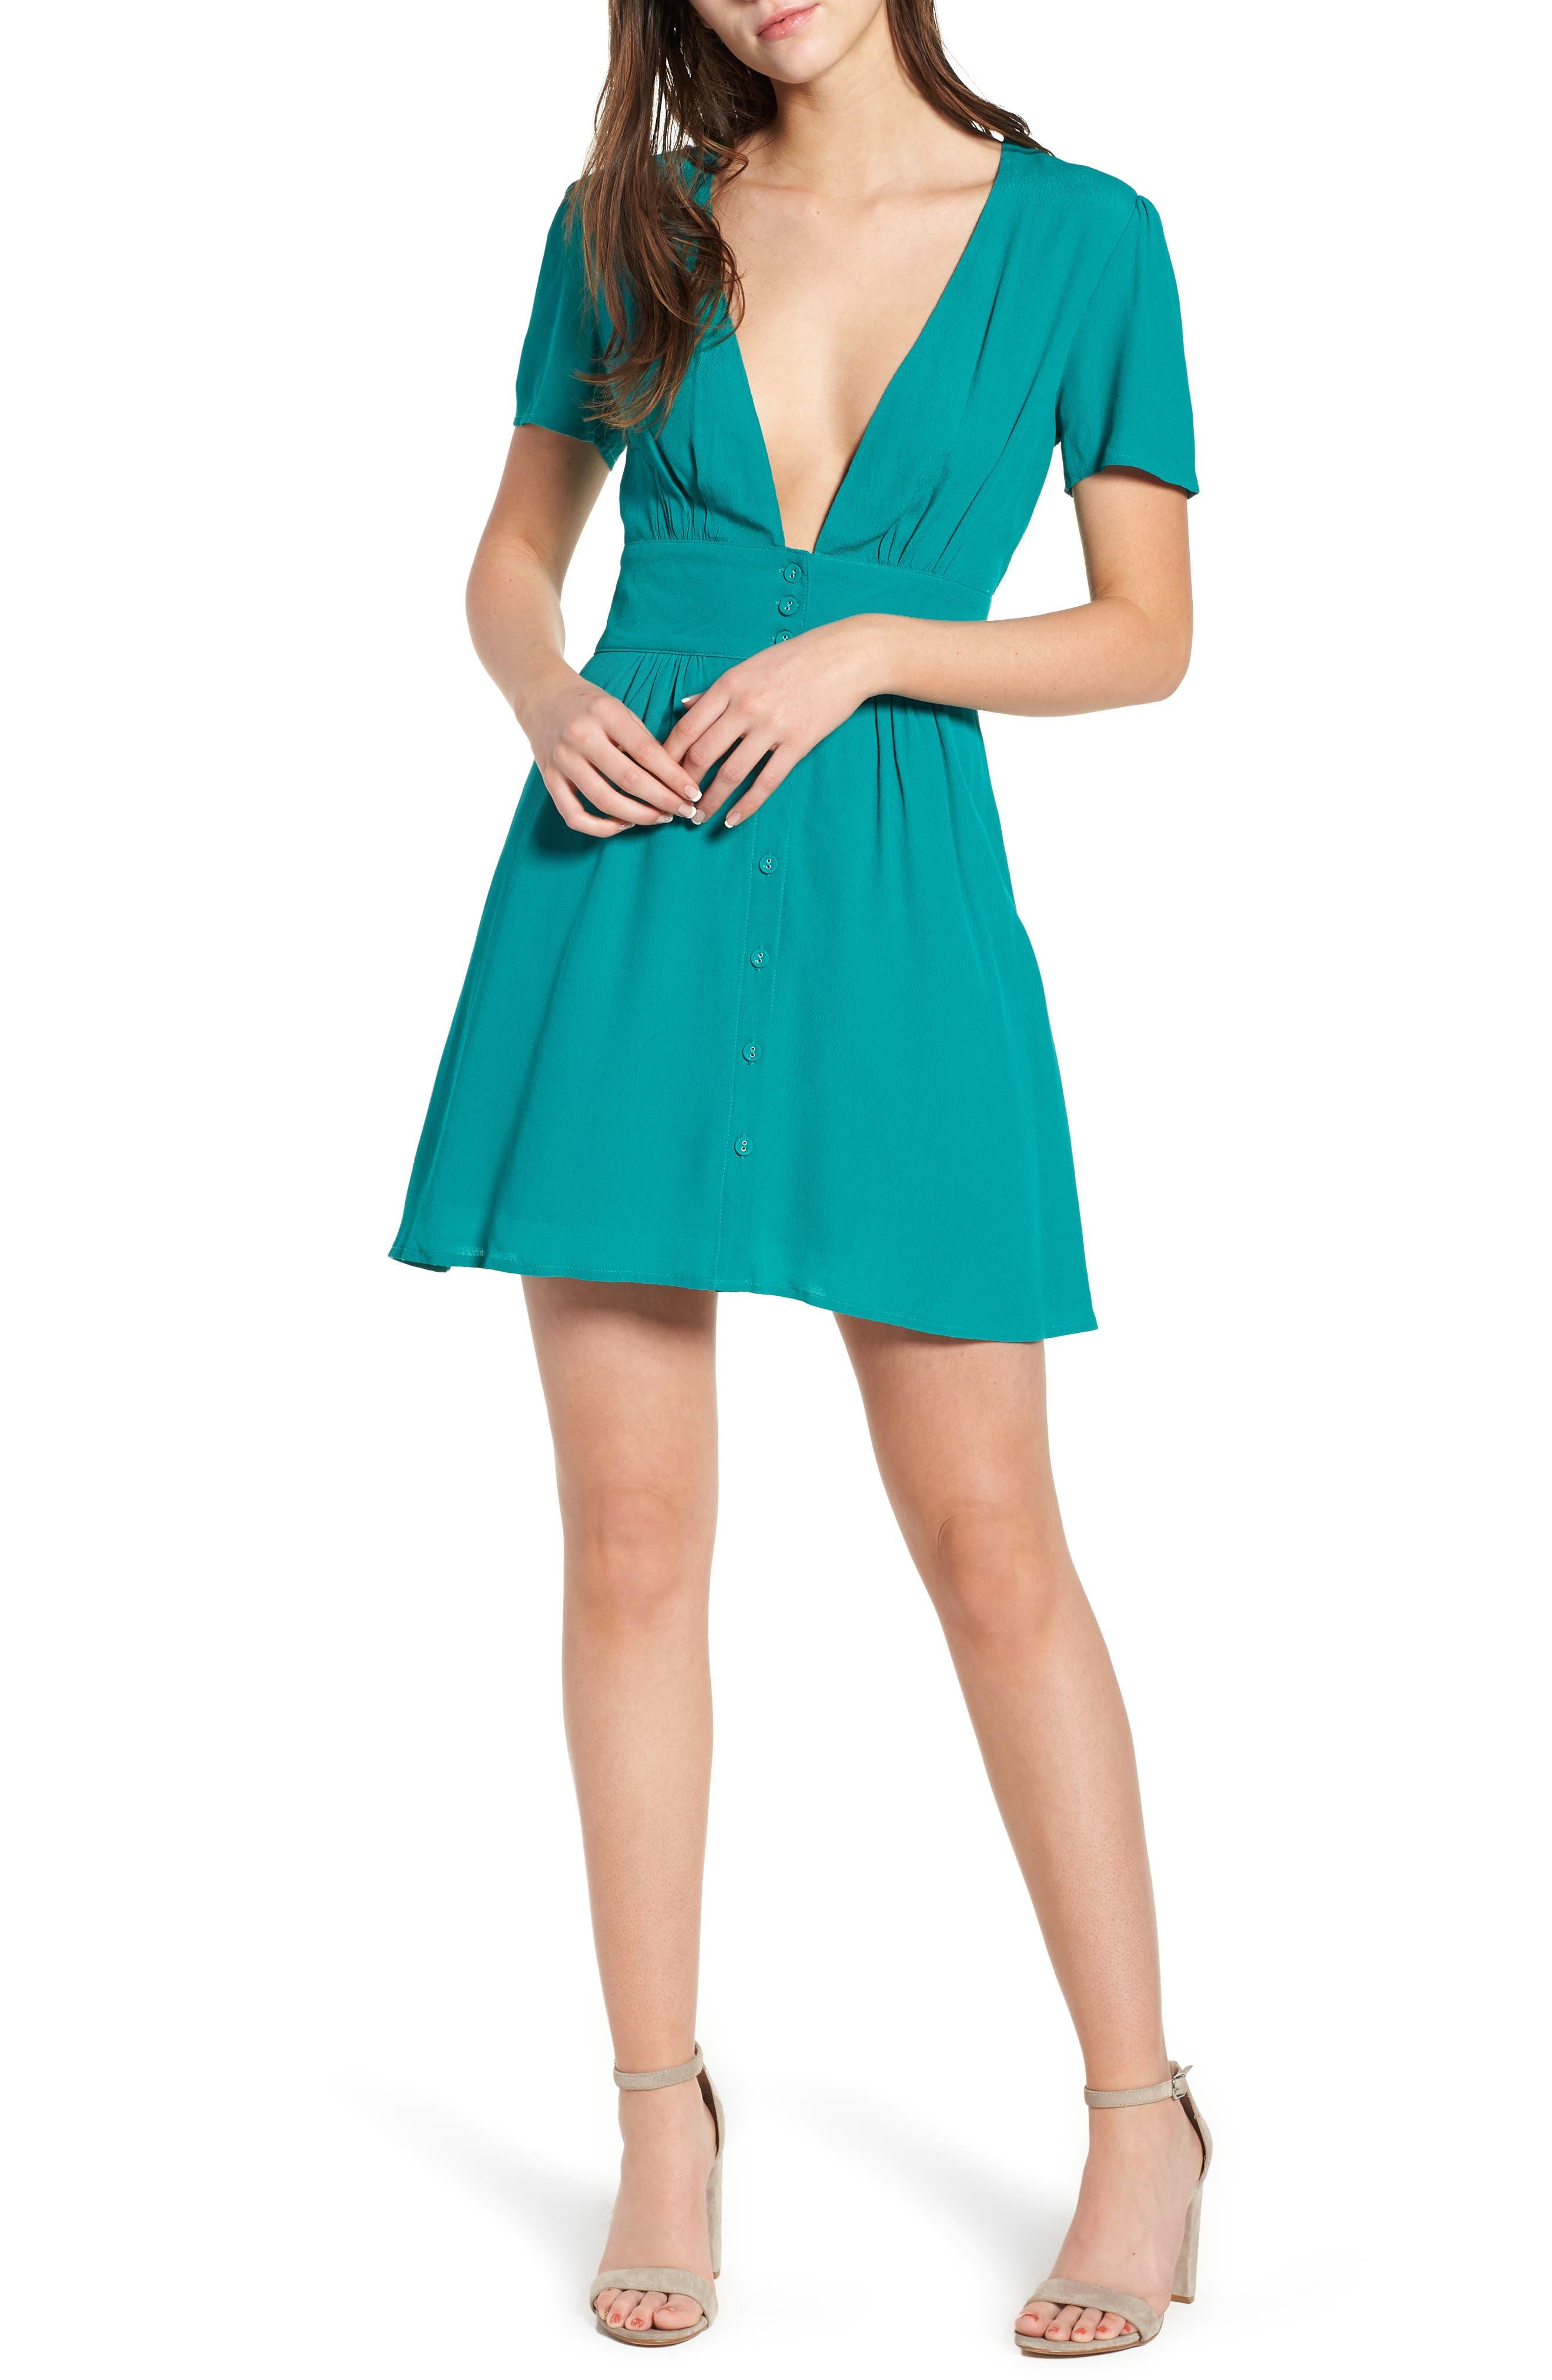 Verdera Plunging Minidress,                             Main thumbnail 1, color,                             Green